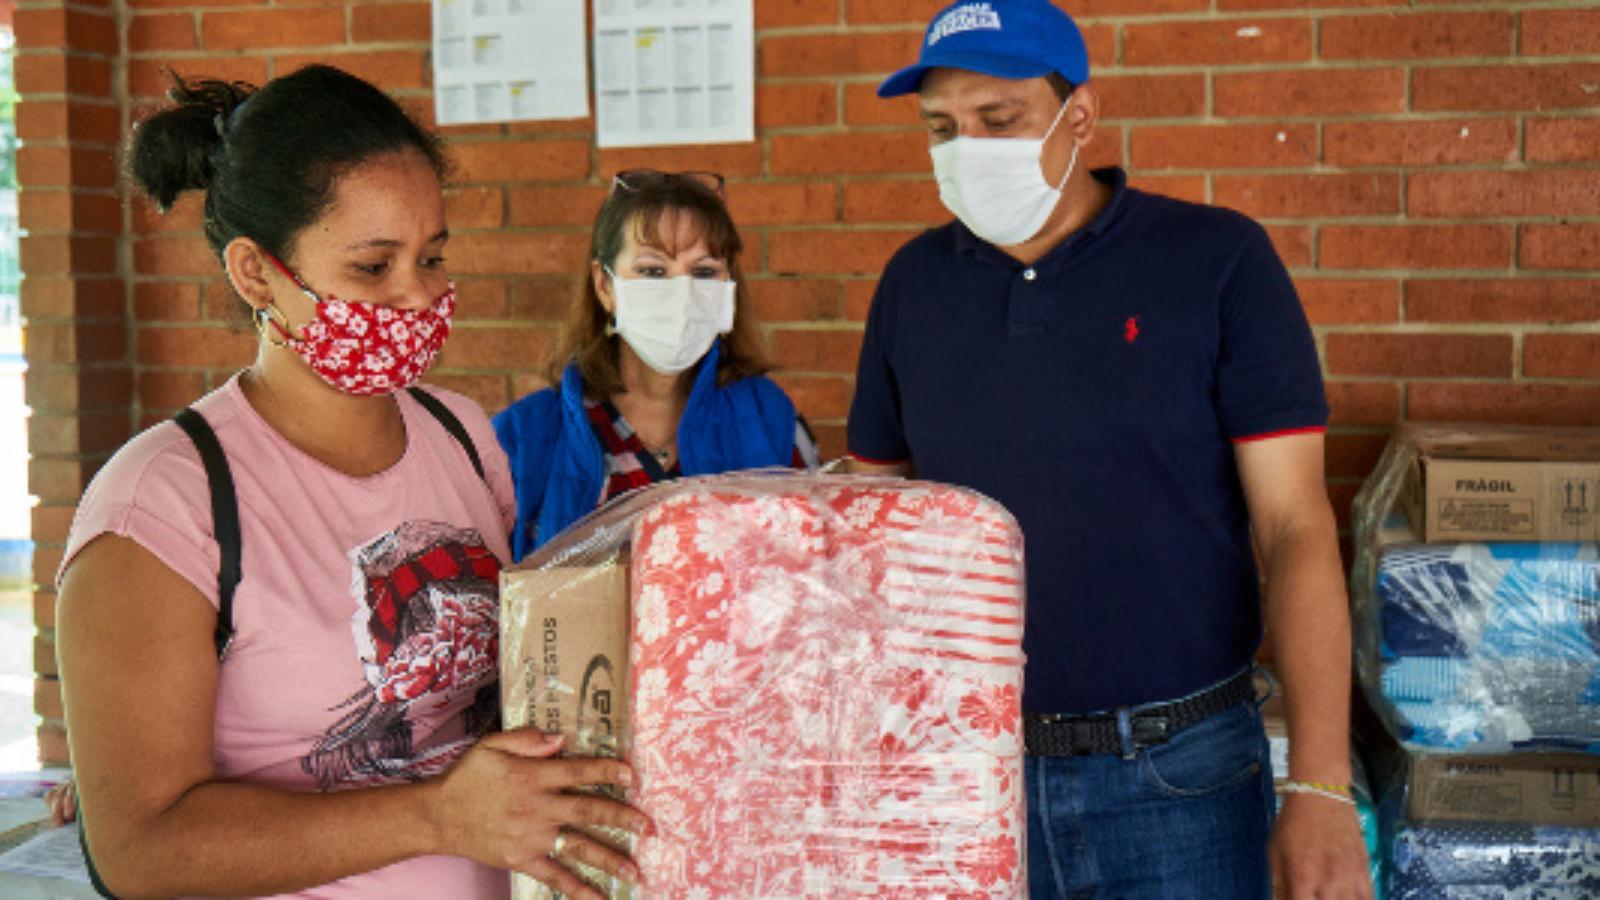 Venezolanas en riesgo de explotación sexual recibieron ayudas en Bucaramanga